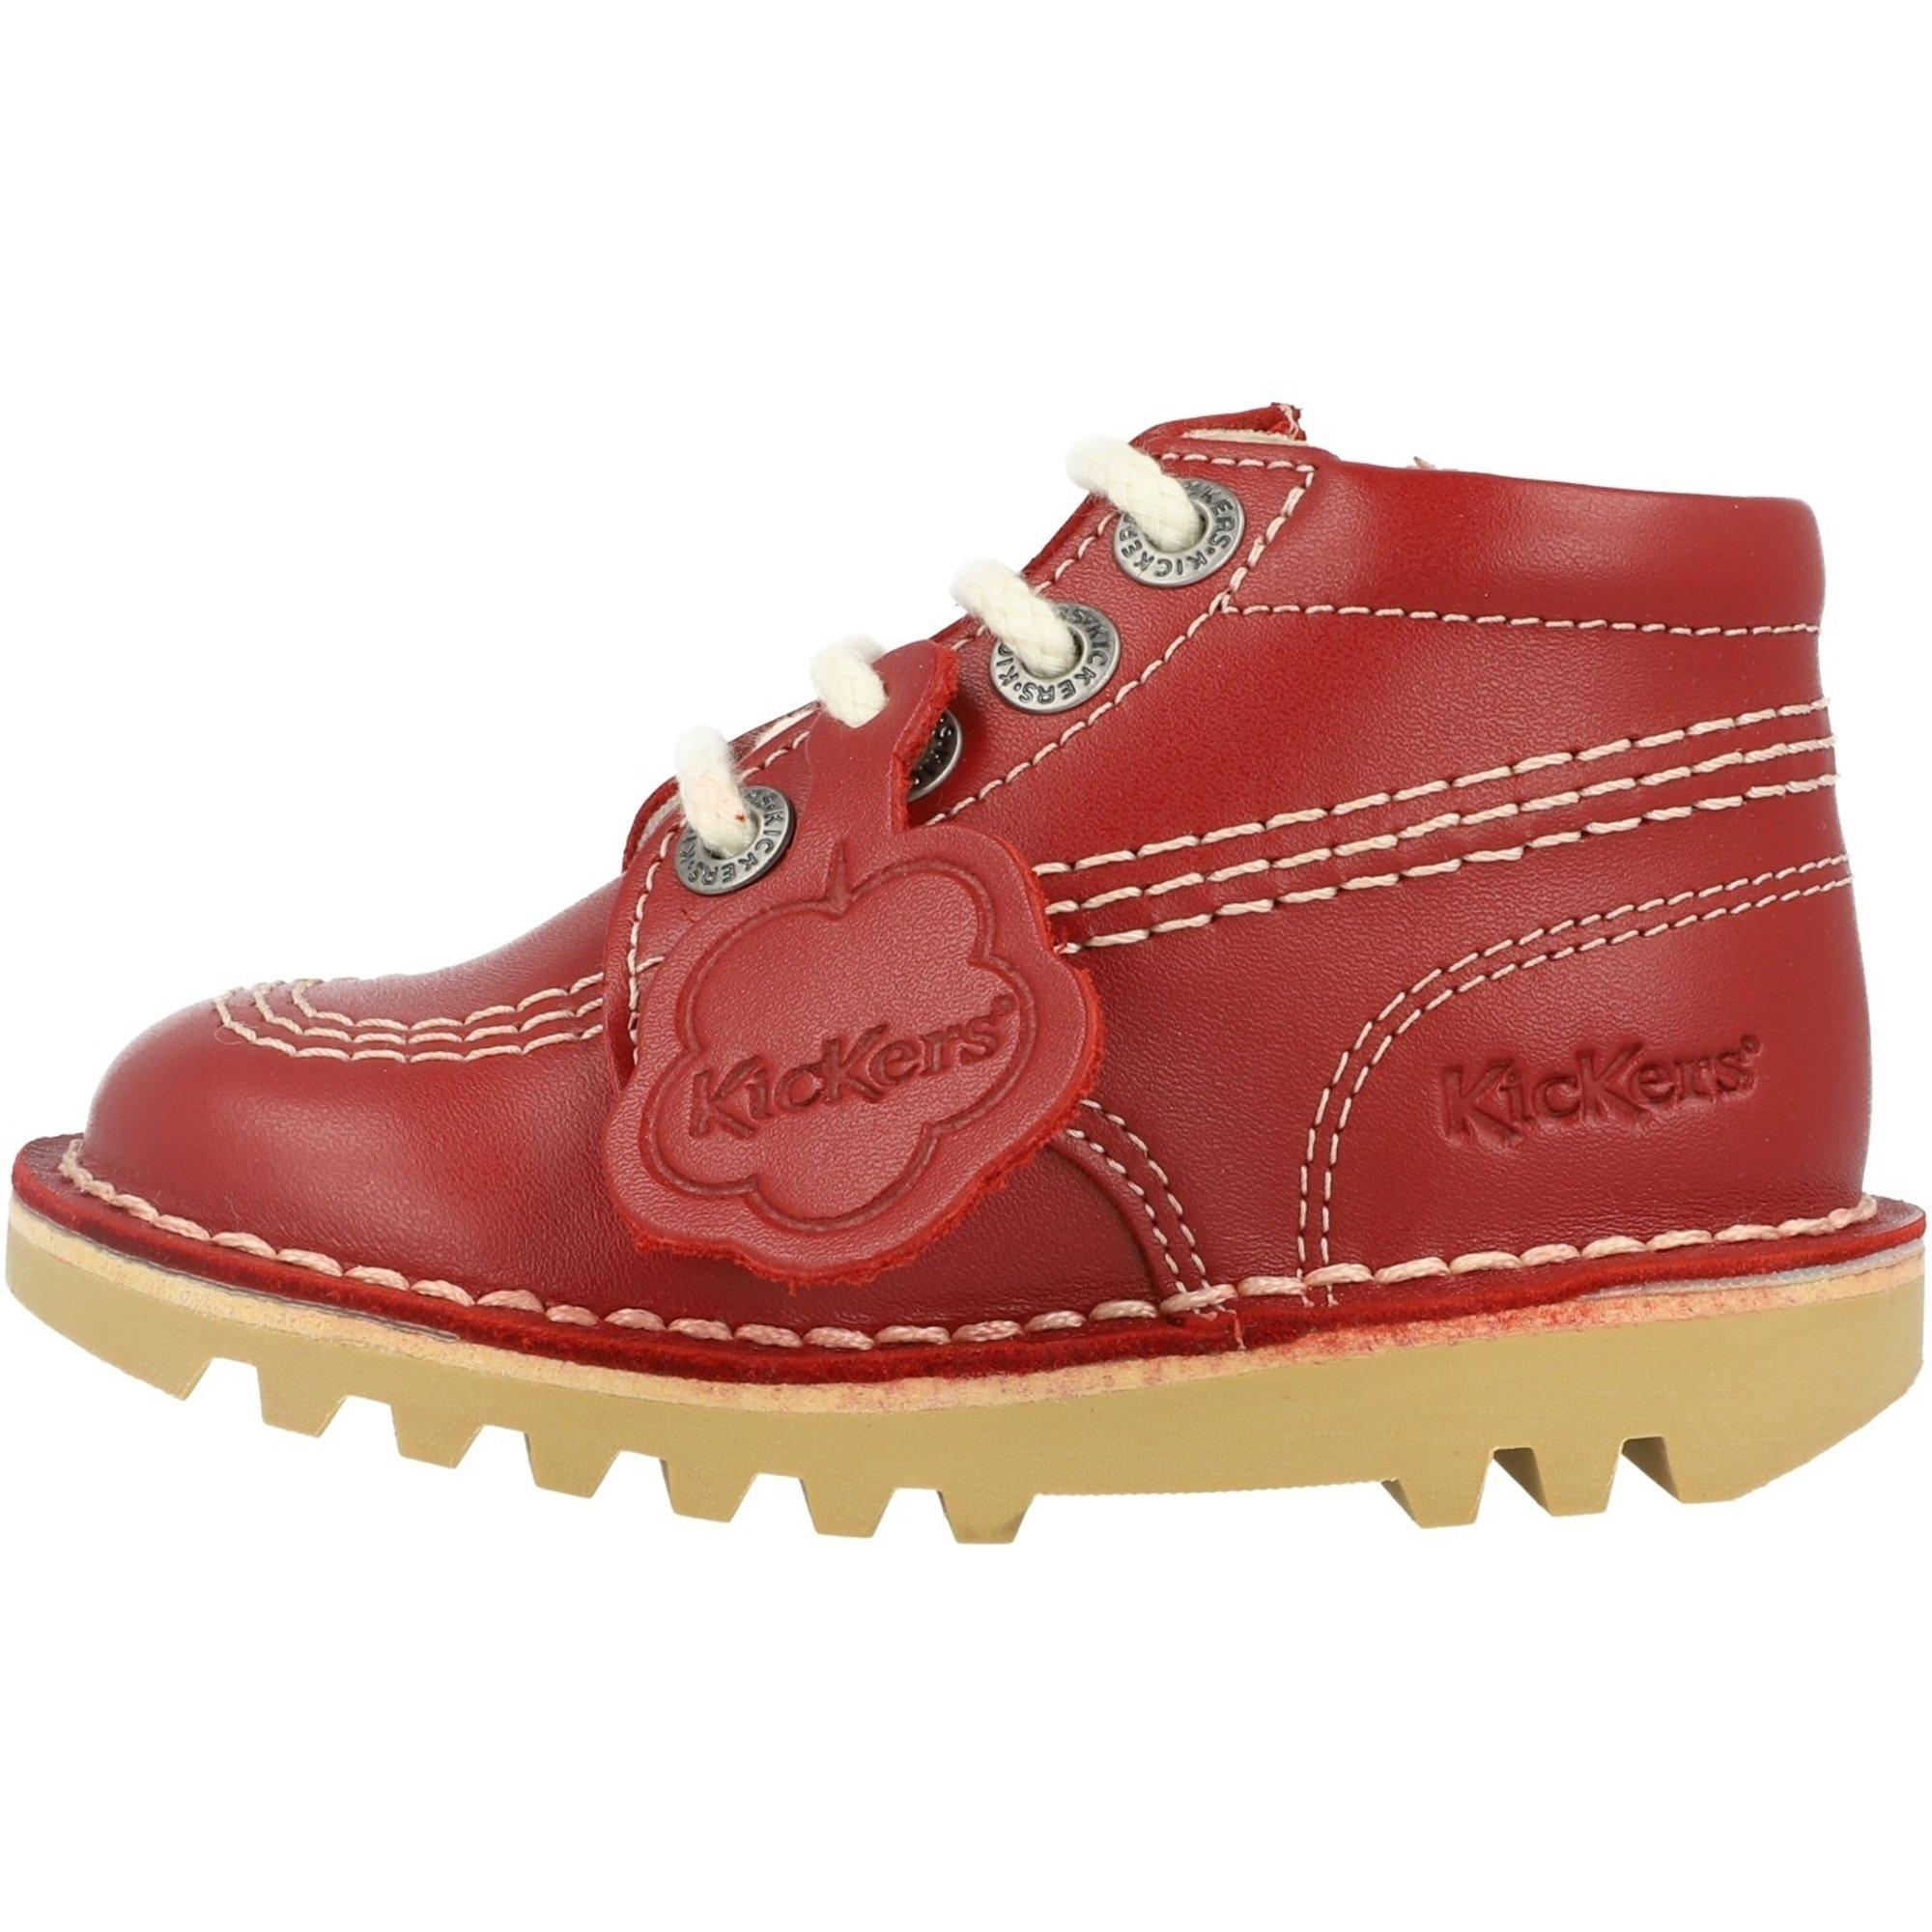 Kickers Kick Hi Zip I Red Leather